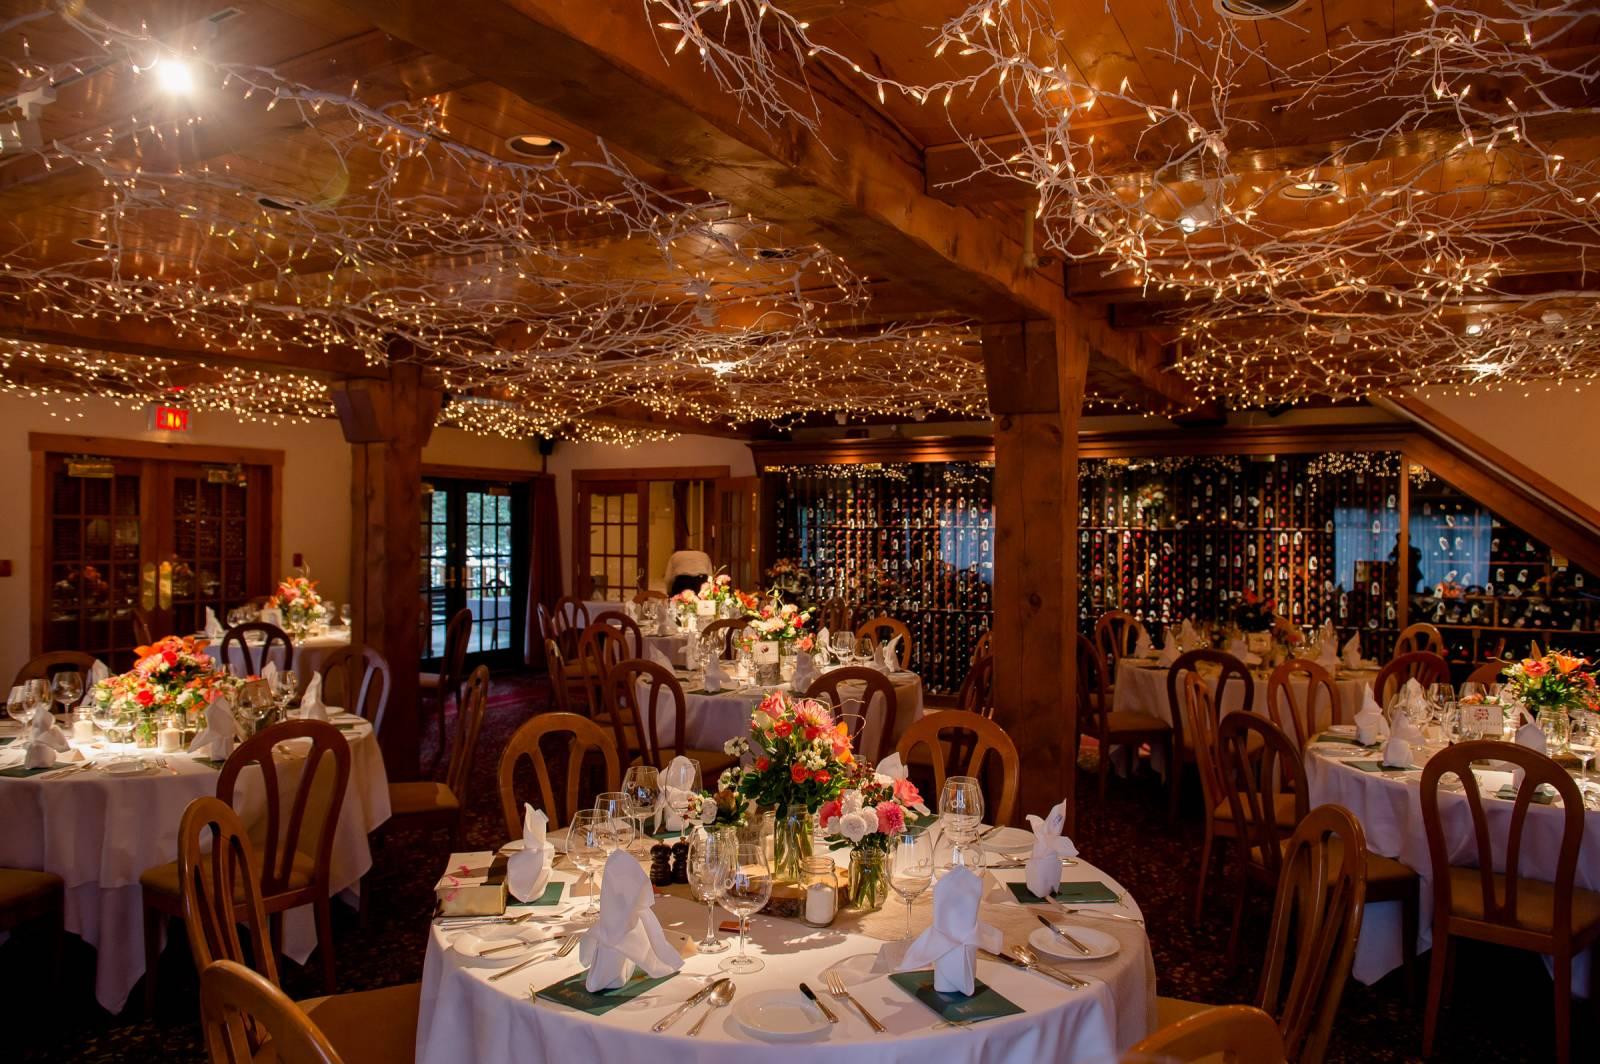 The Post Hotel Lake Louise Wedding Venue | Alberta Wedding ...